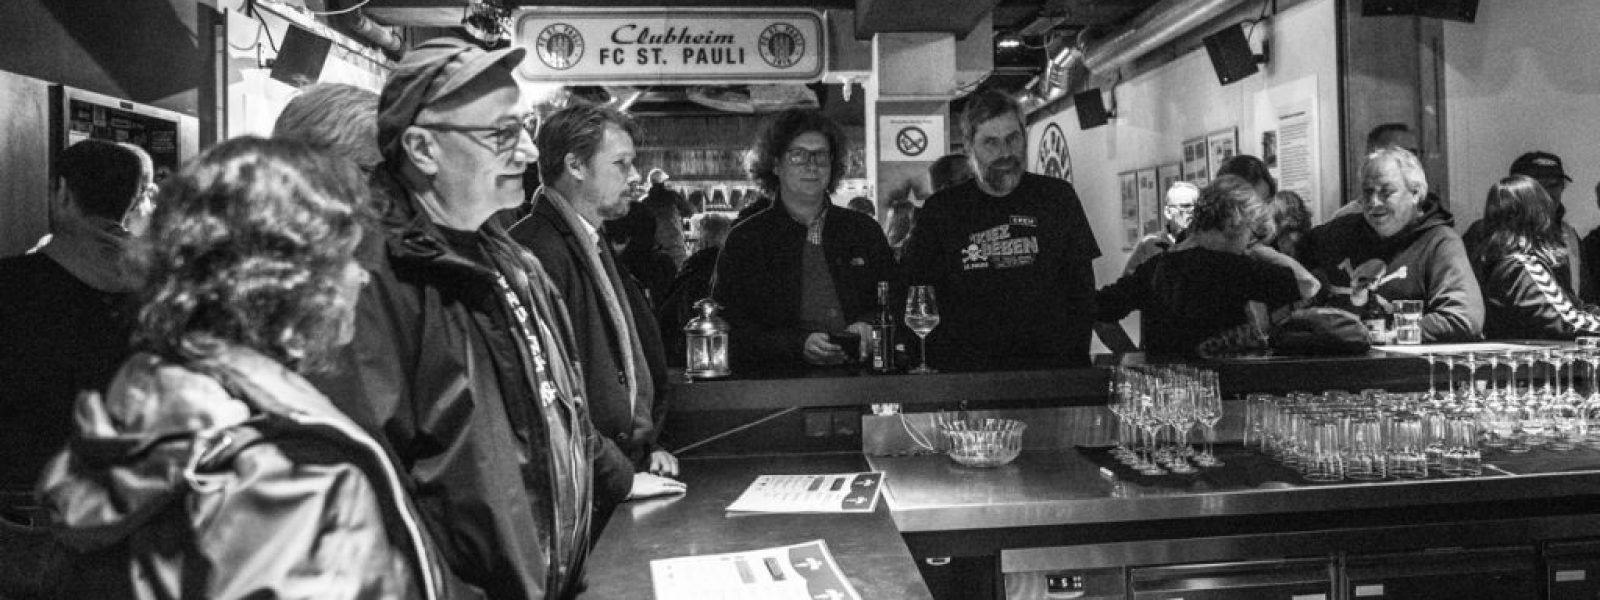 Eroeffnung FC St Pauli Museum (Foto Sabrina Adeline Nagel) - 2